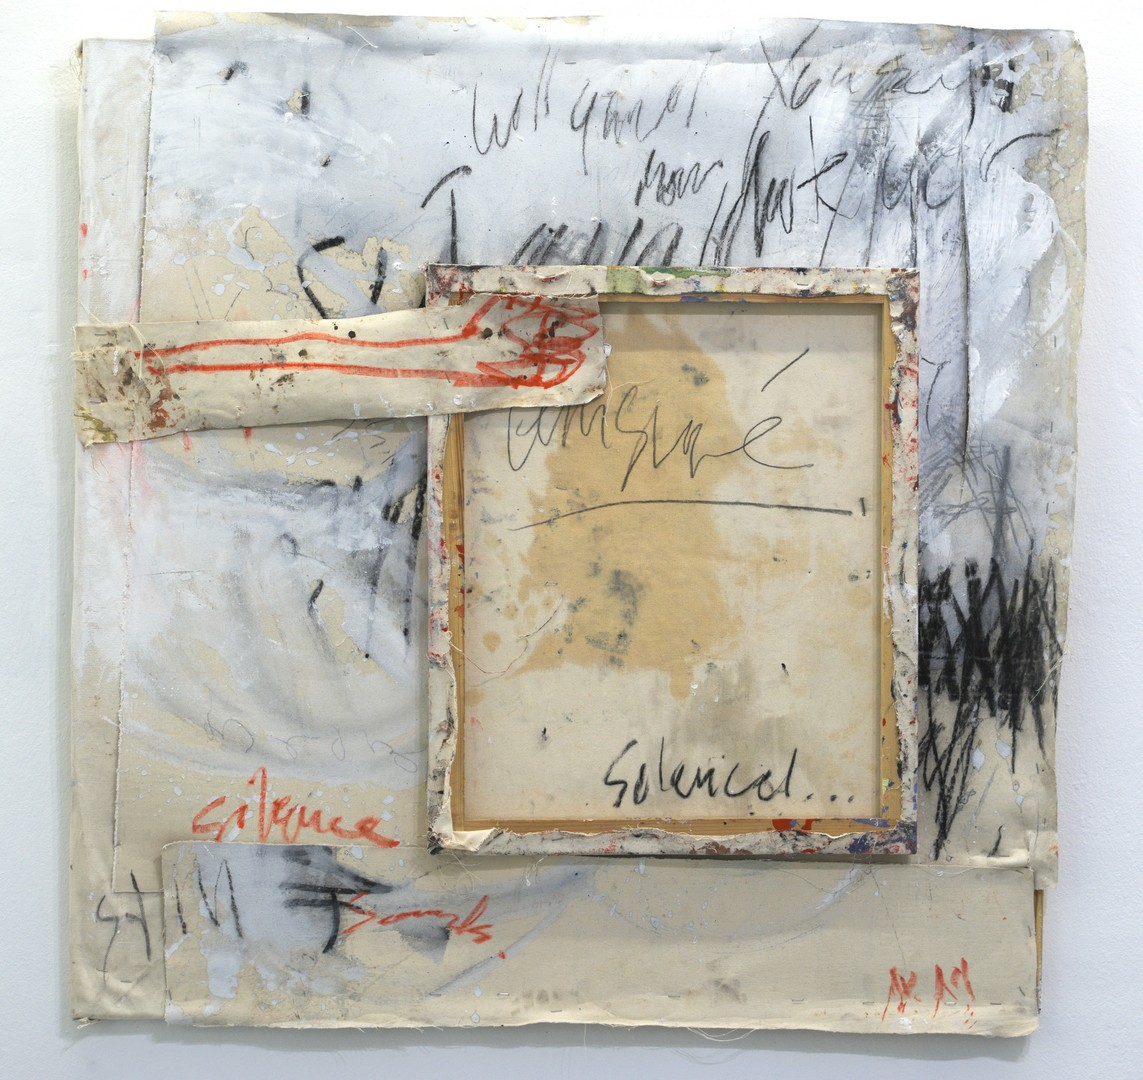 »Silenced« 2016, recycelte Leinwand, 103 x 102 cm